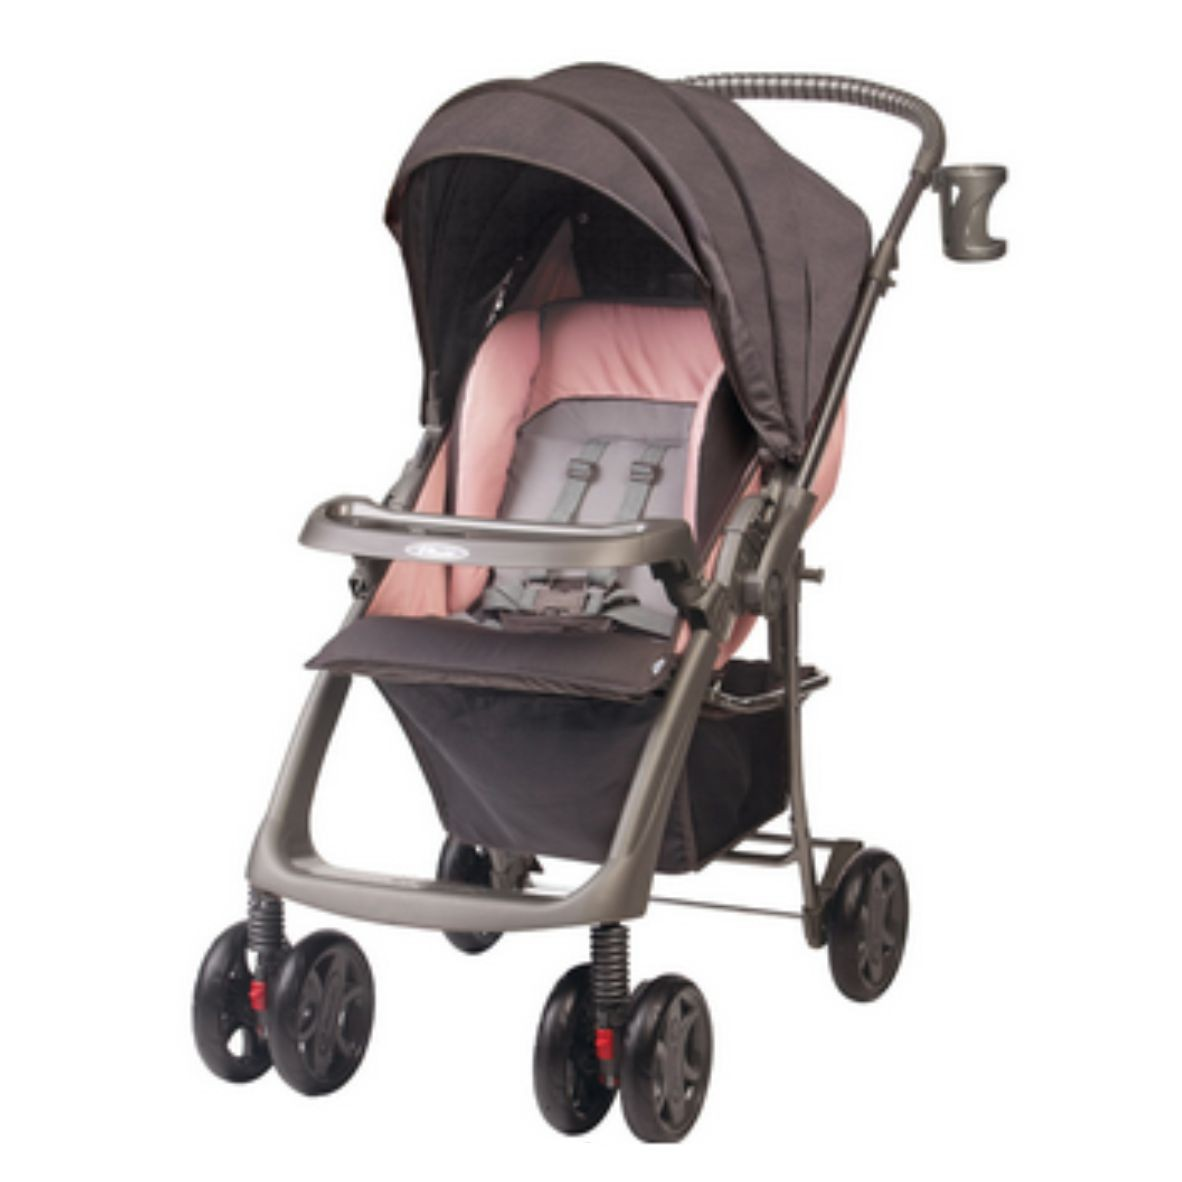 Carrinho de Bebê Premium Rubi Rosa Mate - Hércules